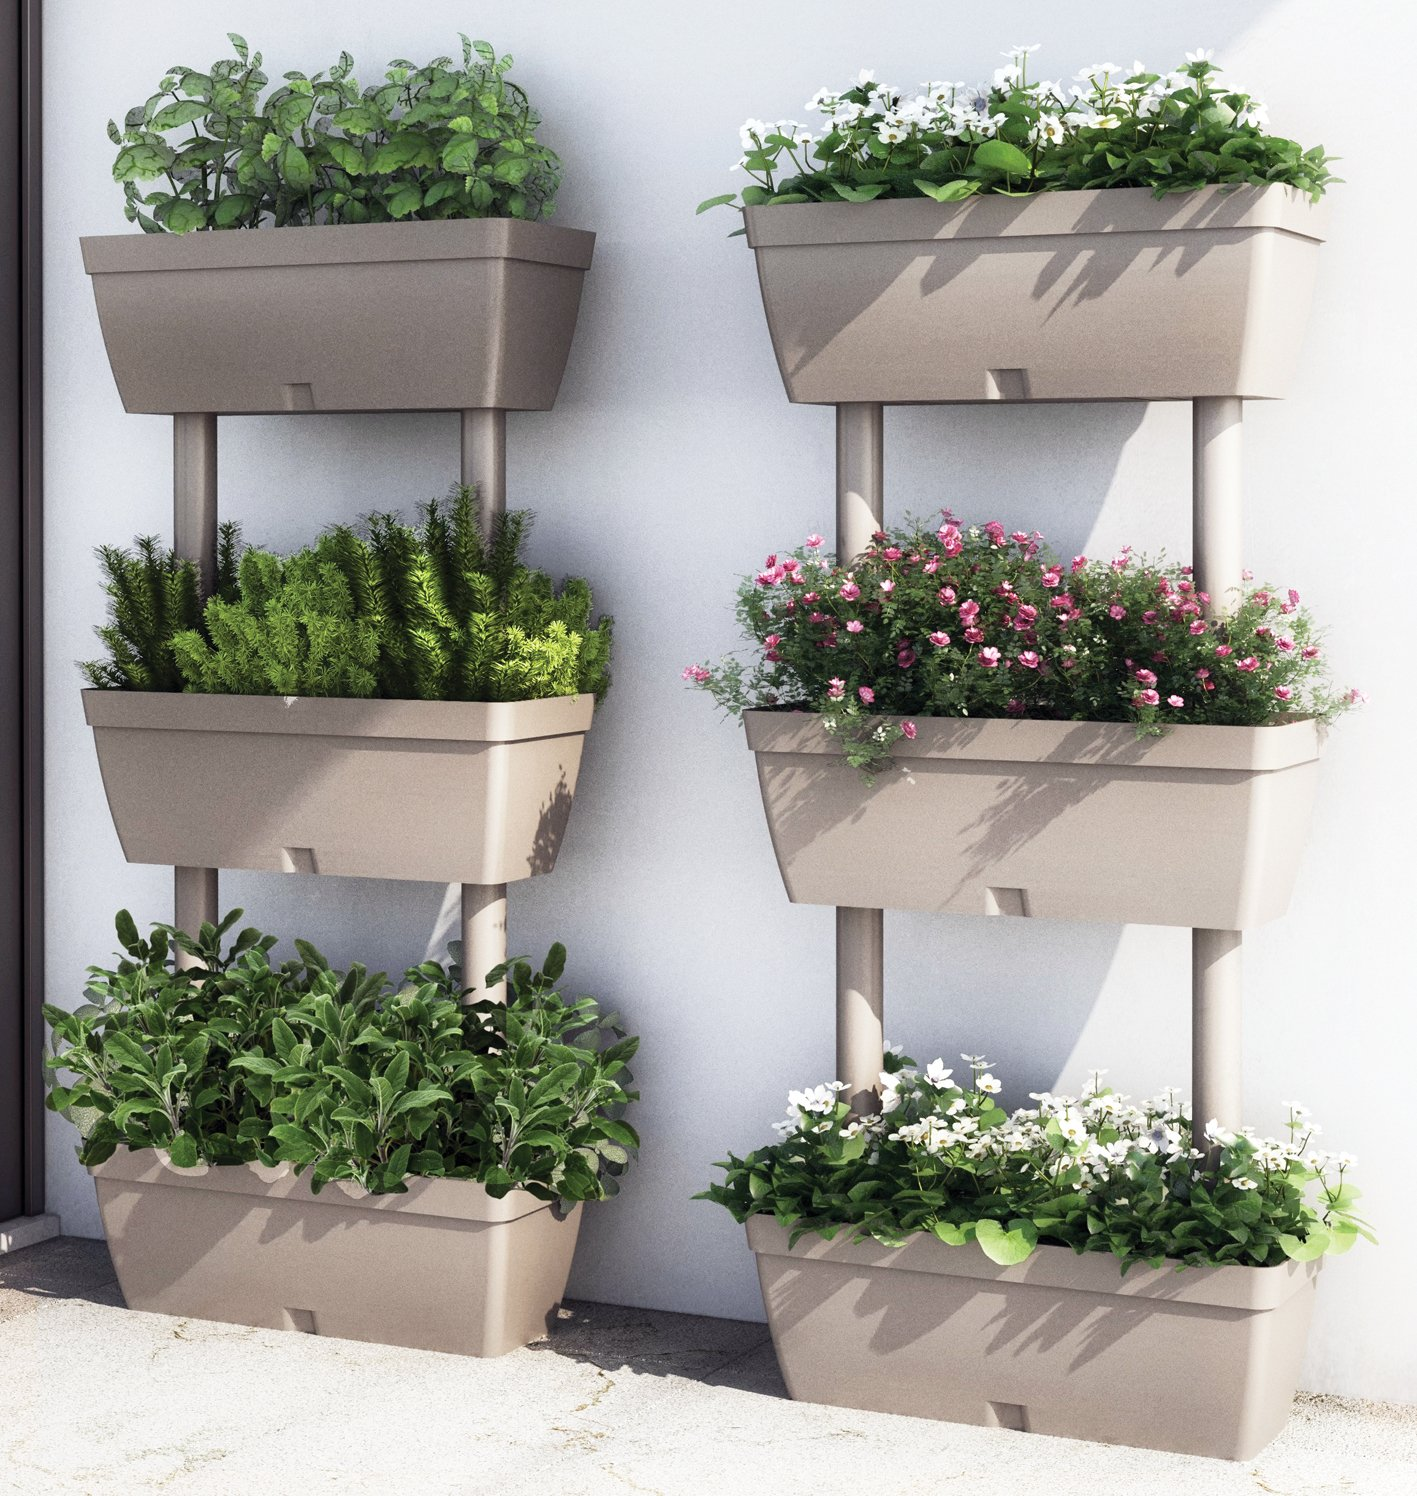 Alberi da vaso giardino mediterraneo for Vendita piante da giardino